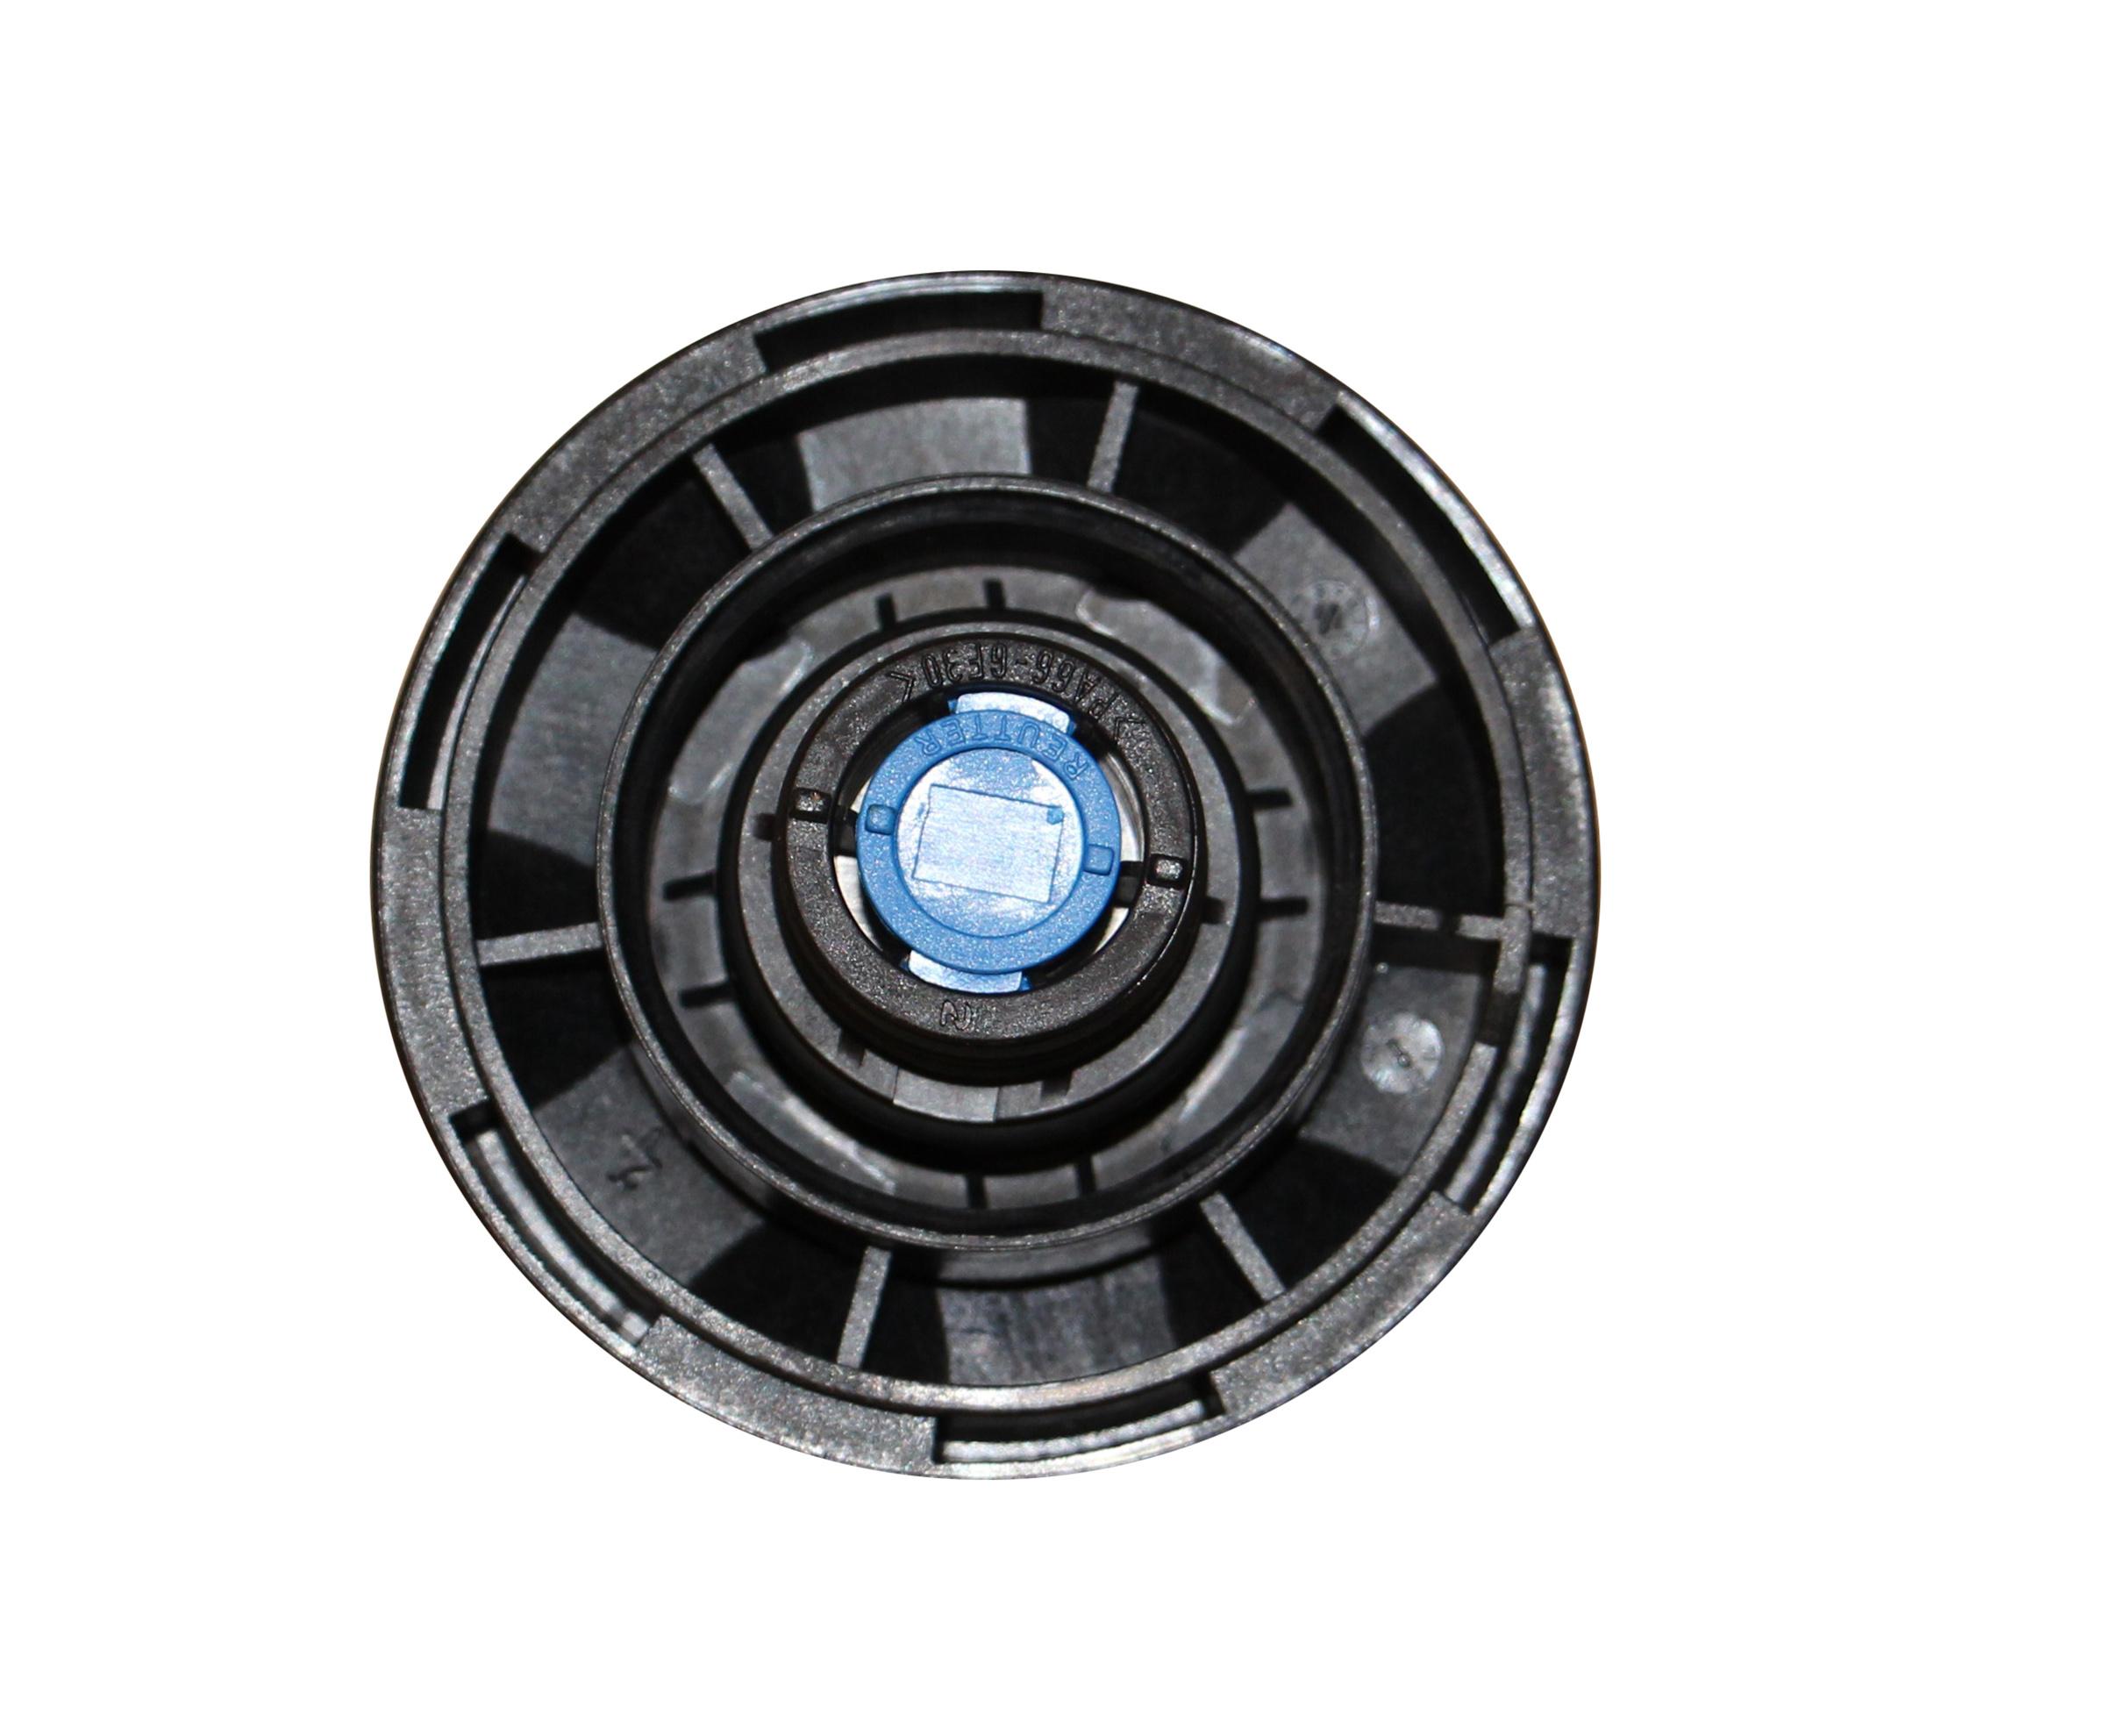 Radiator Cap Genuine For BMW 17117639020